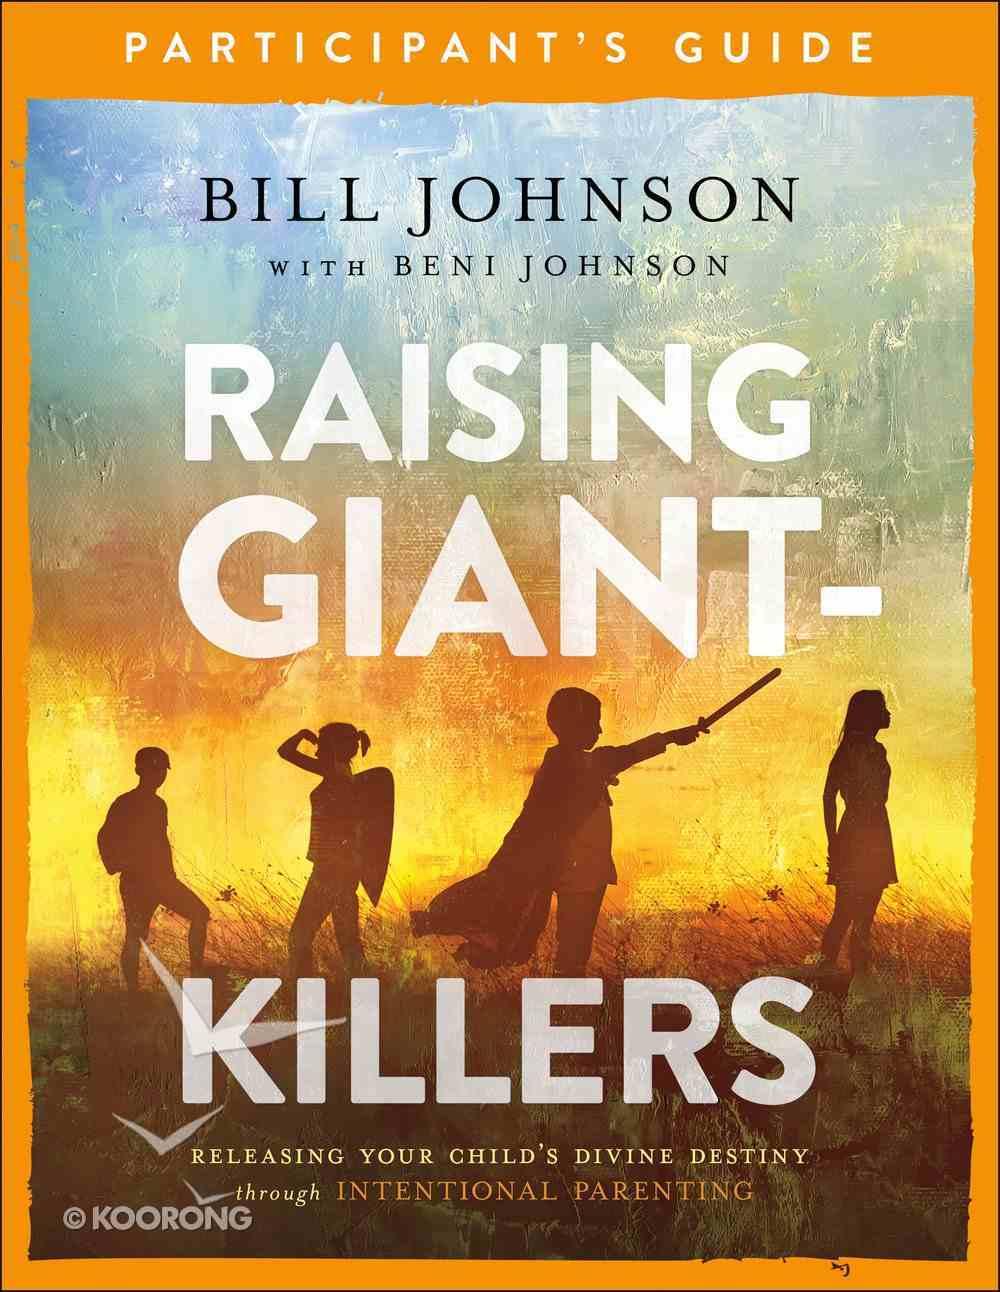 Raising Giant-Killers: Releasing Your Child's Divine Destiny Through Intentional Parenting (Participant's Guide) Paperback